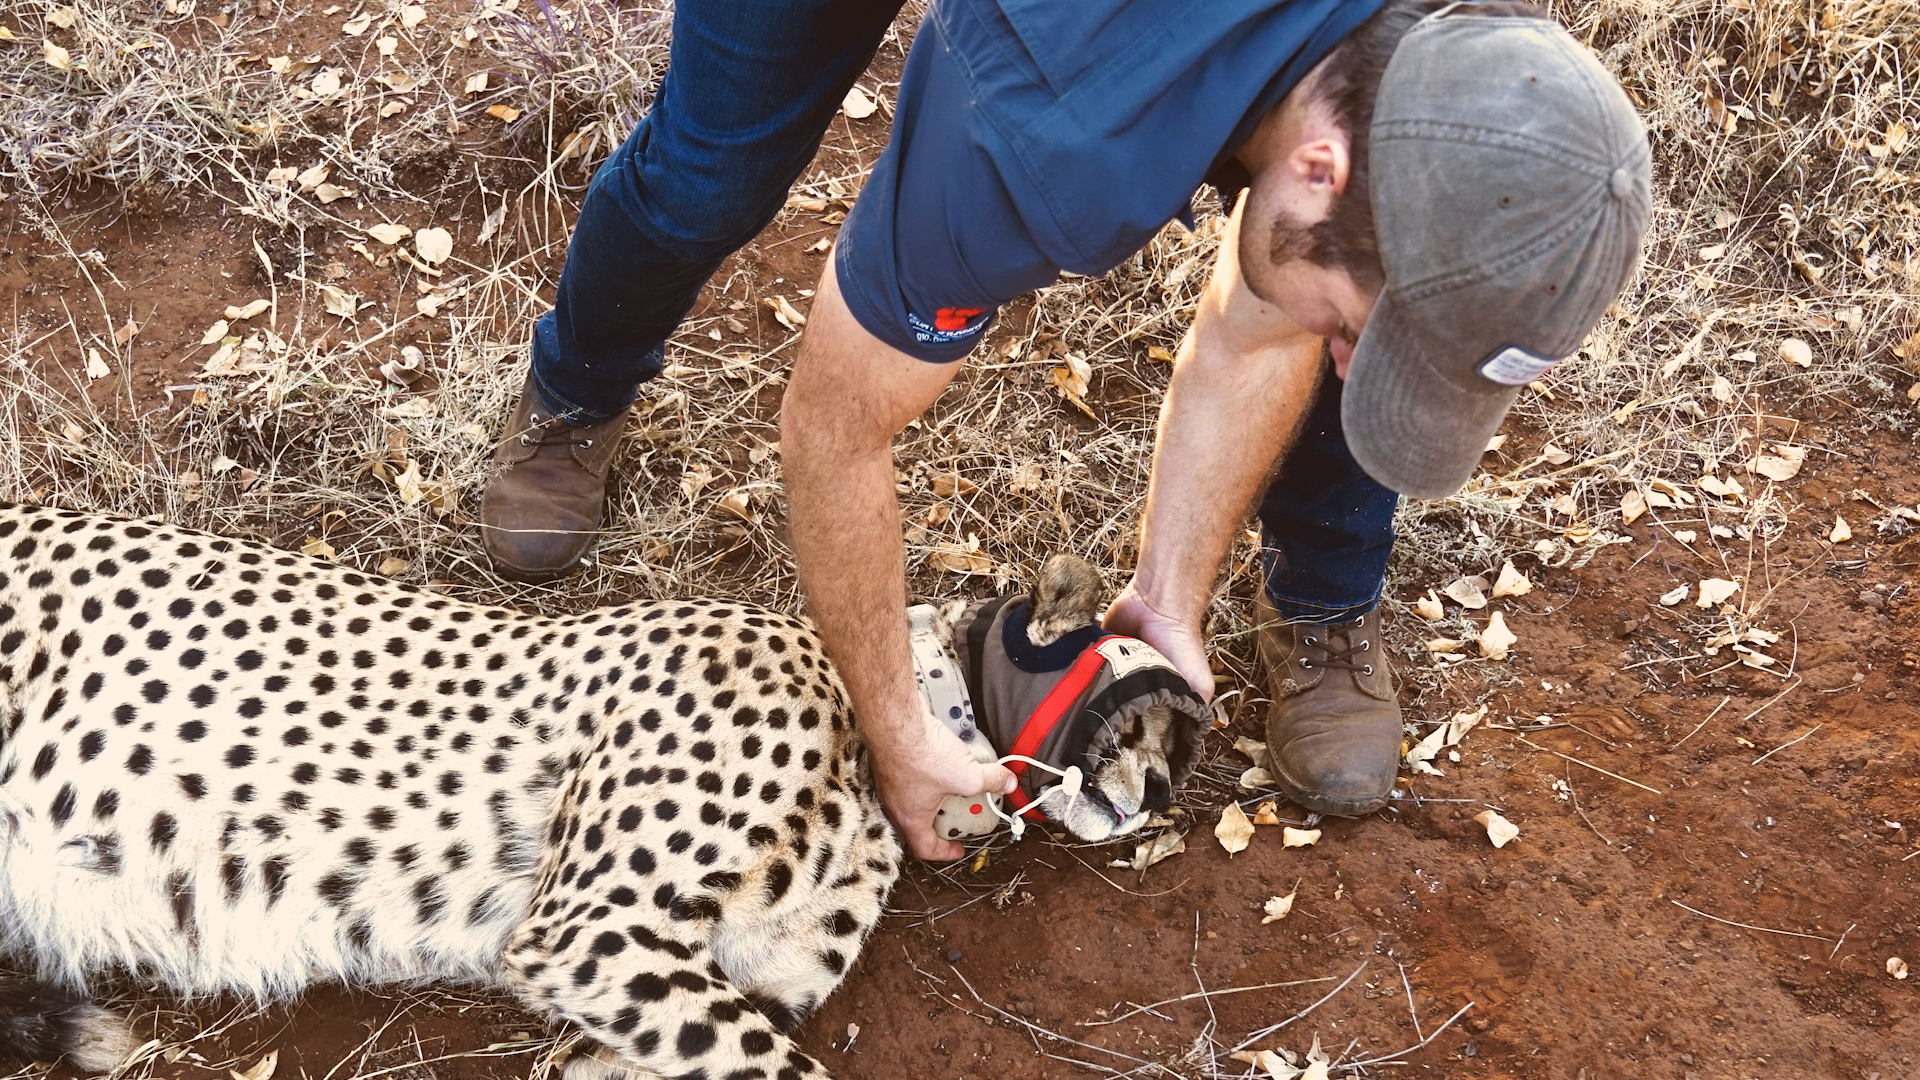 Vincent van der Merwe Saving Africa's **cheetahs**